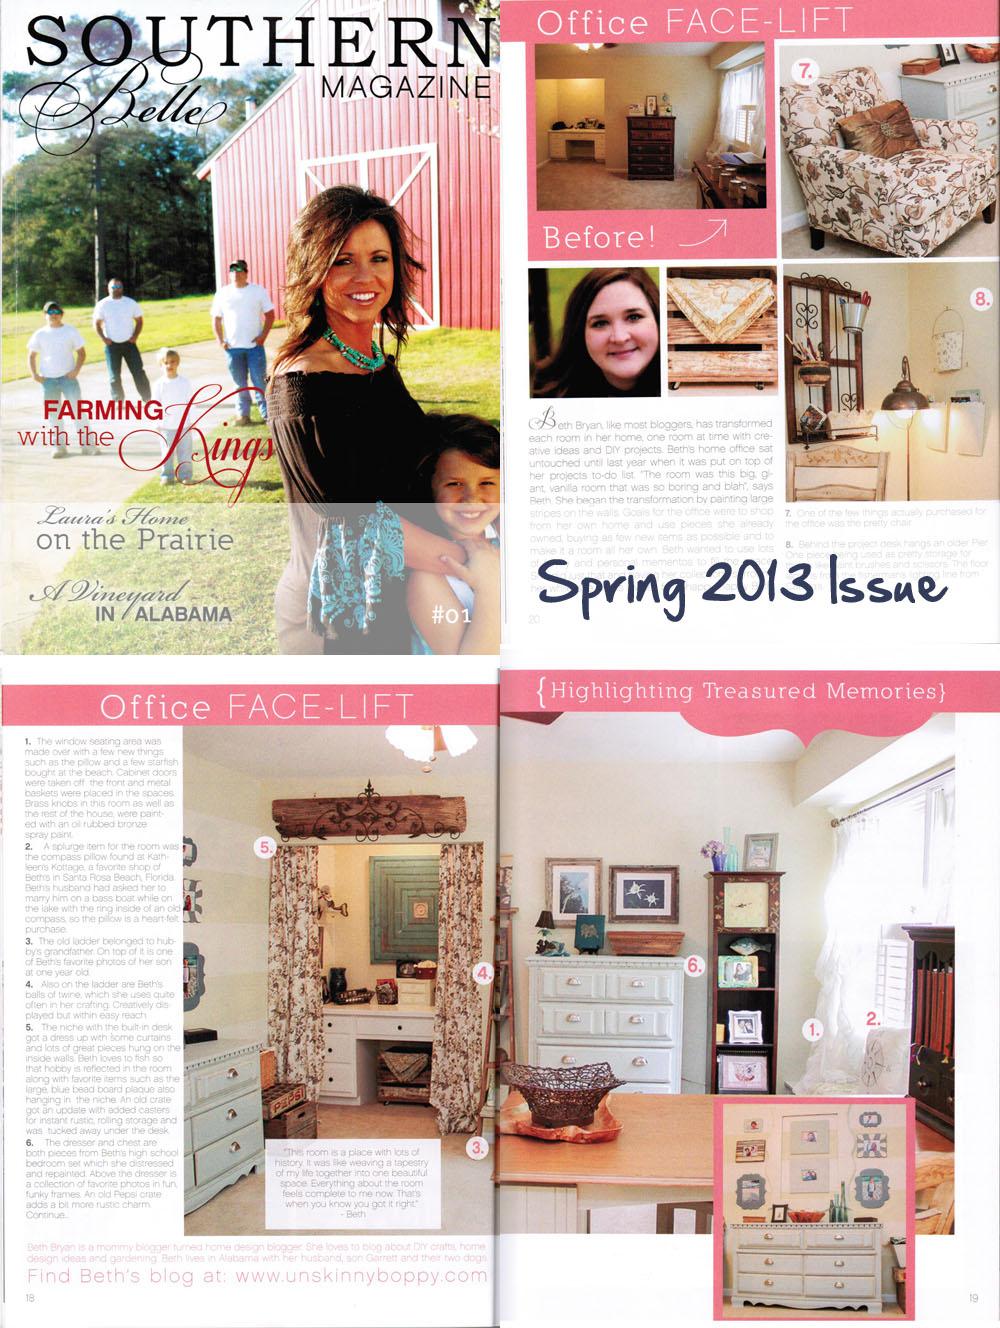 SouthernBellemagazinefeature copy